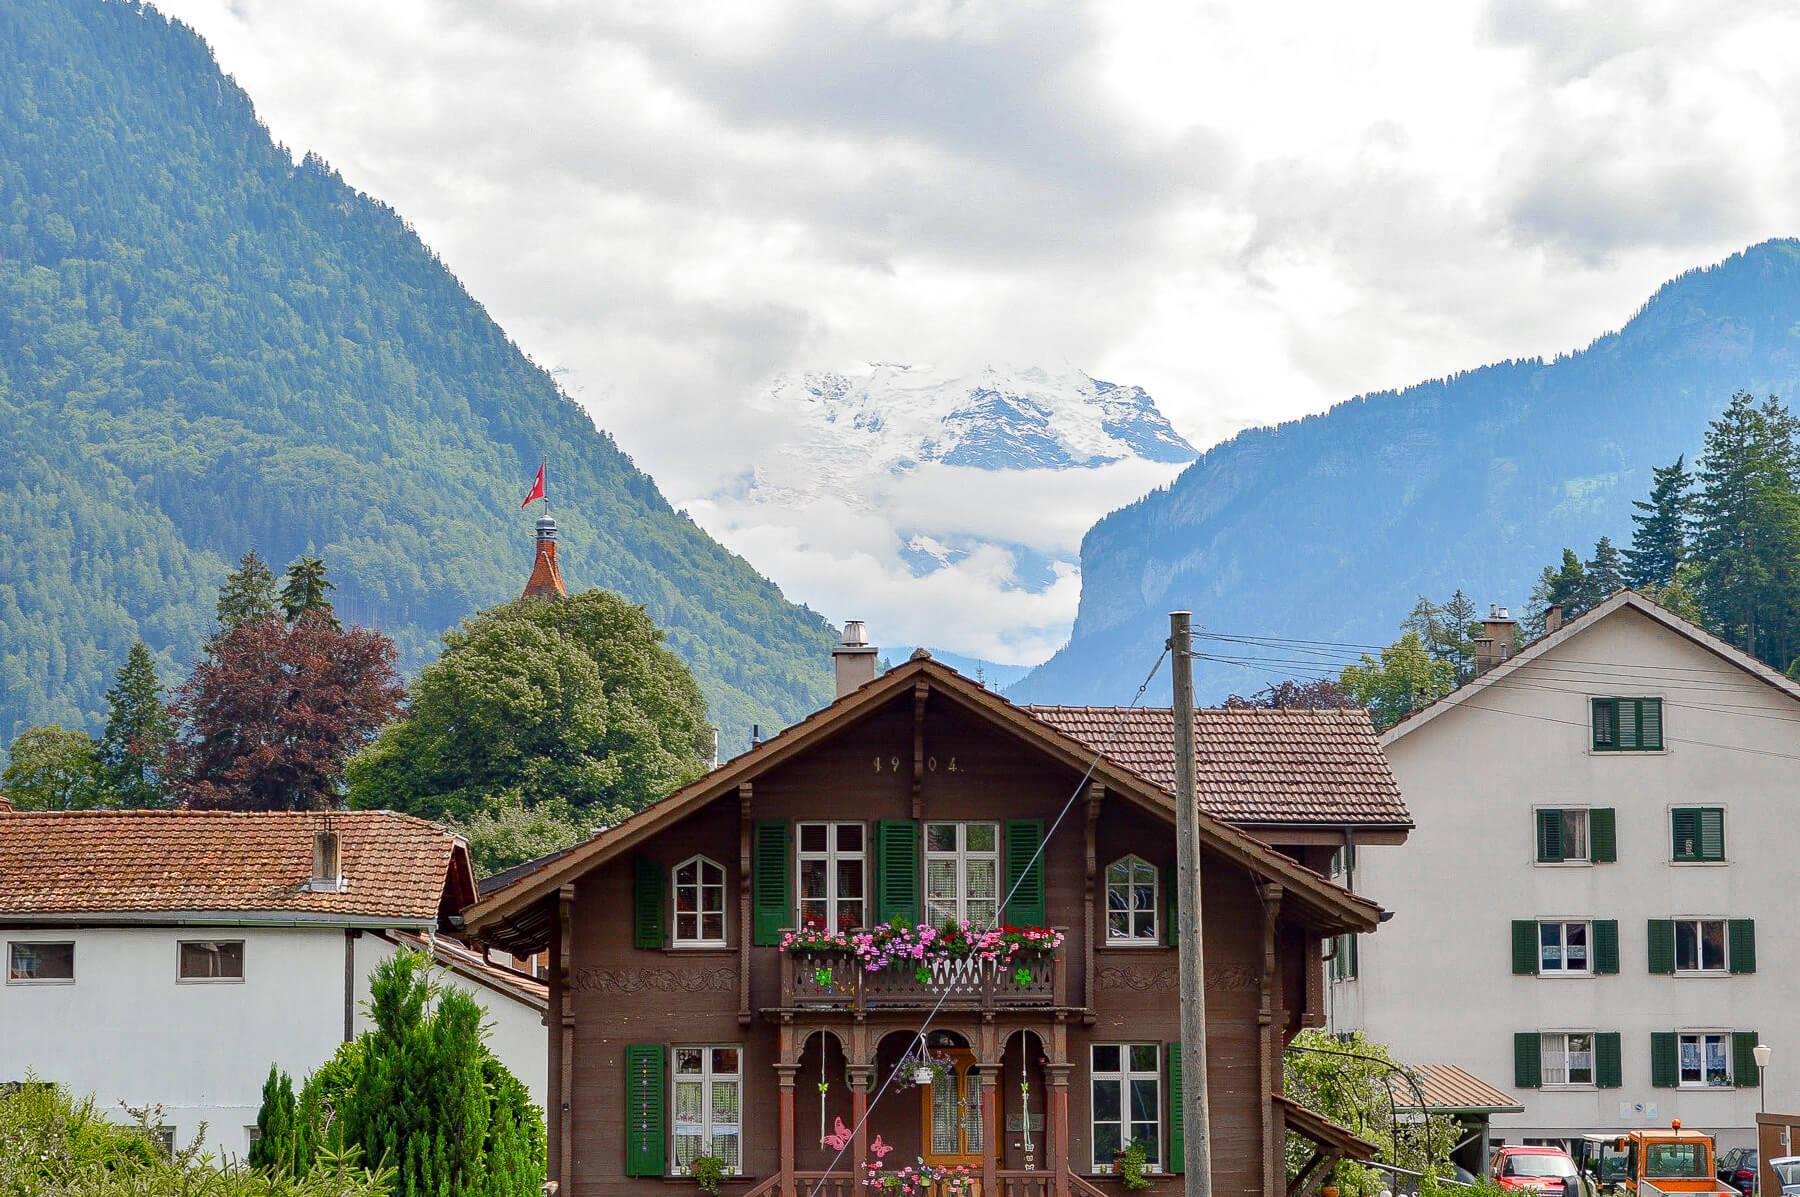 View of Jungfraujoch mountain from Interlaken town